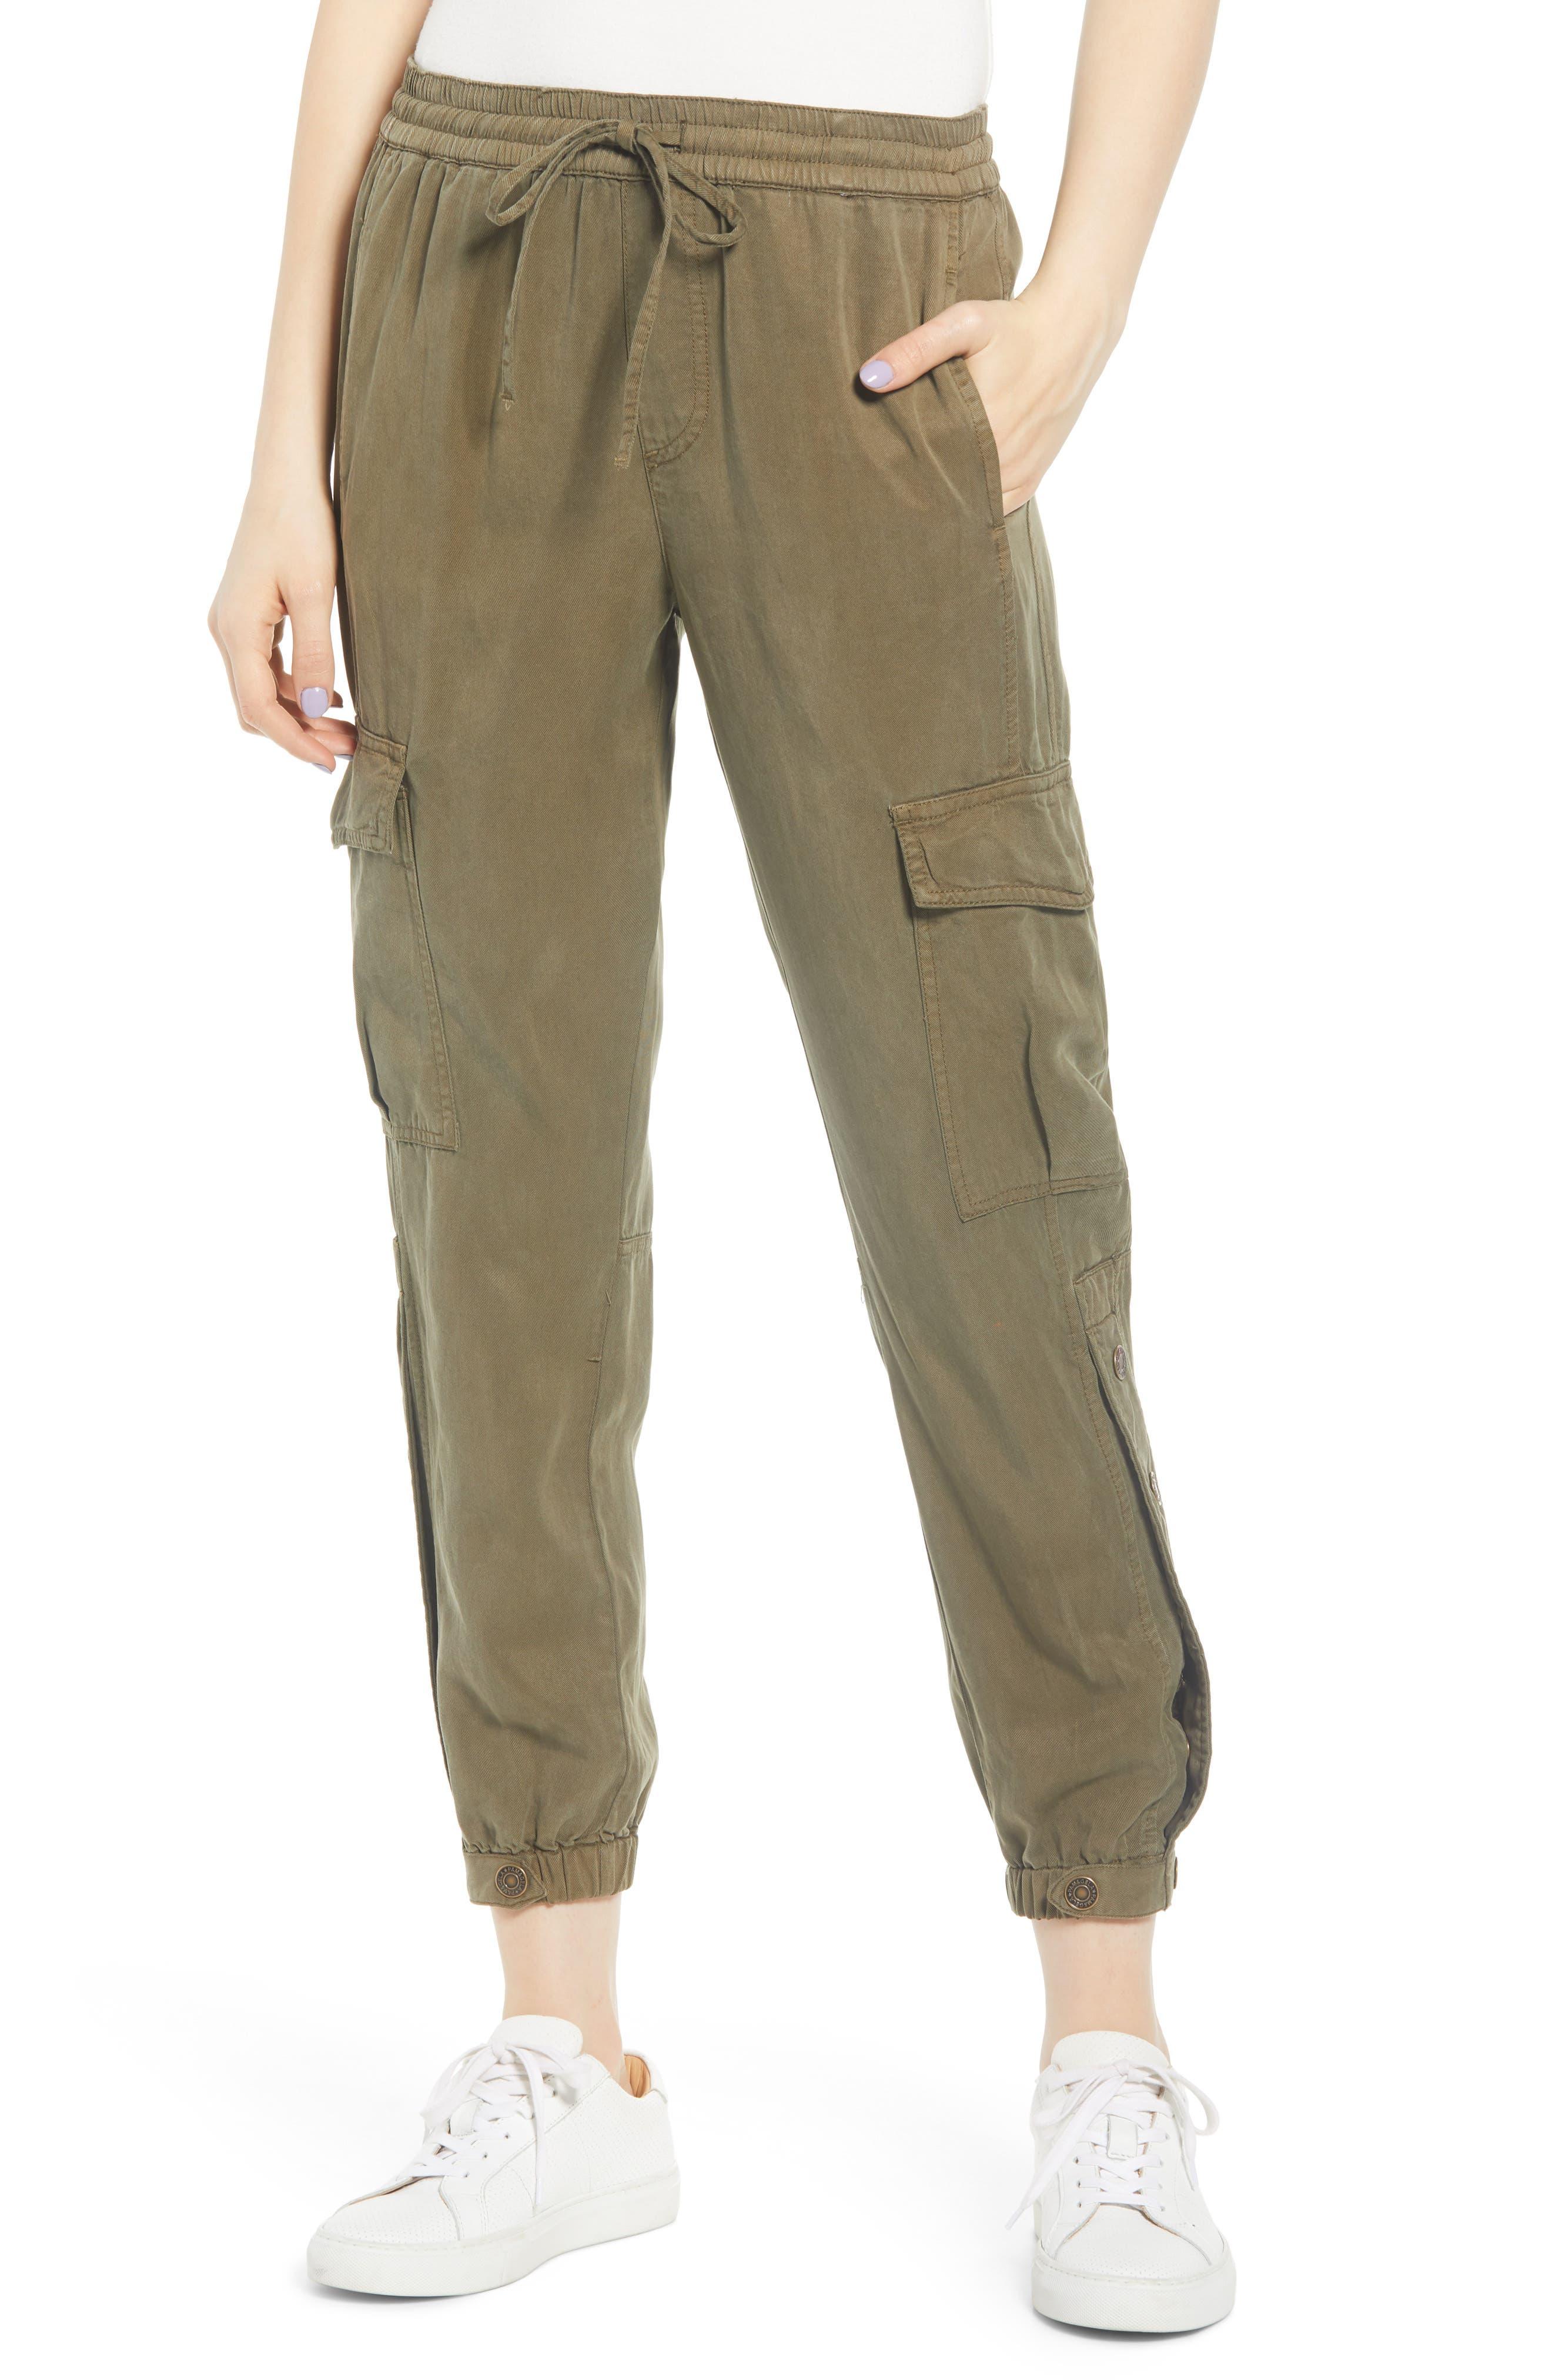 Pam & Gela Snap Leg Cargo Pants, Size Petite - Green